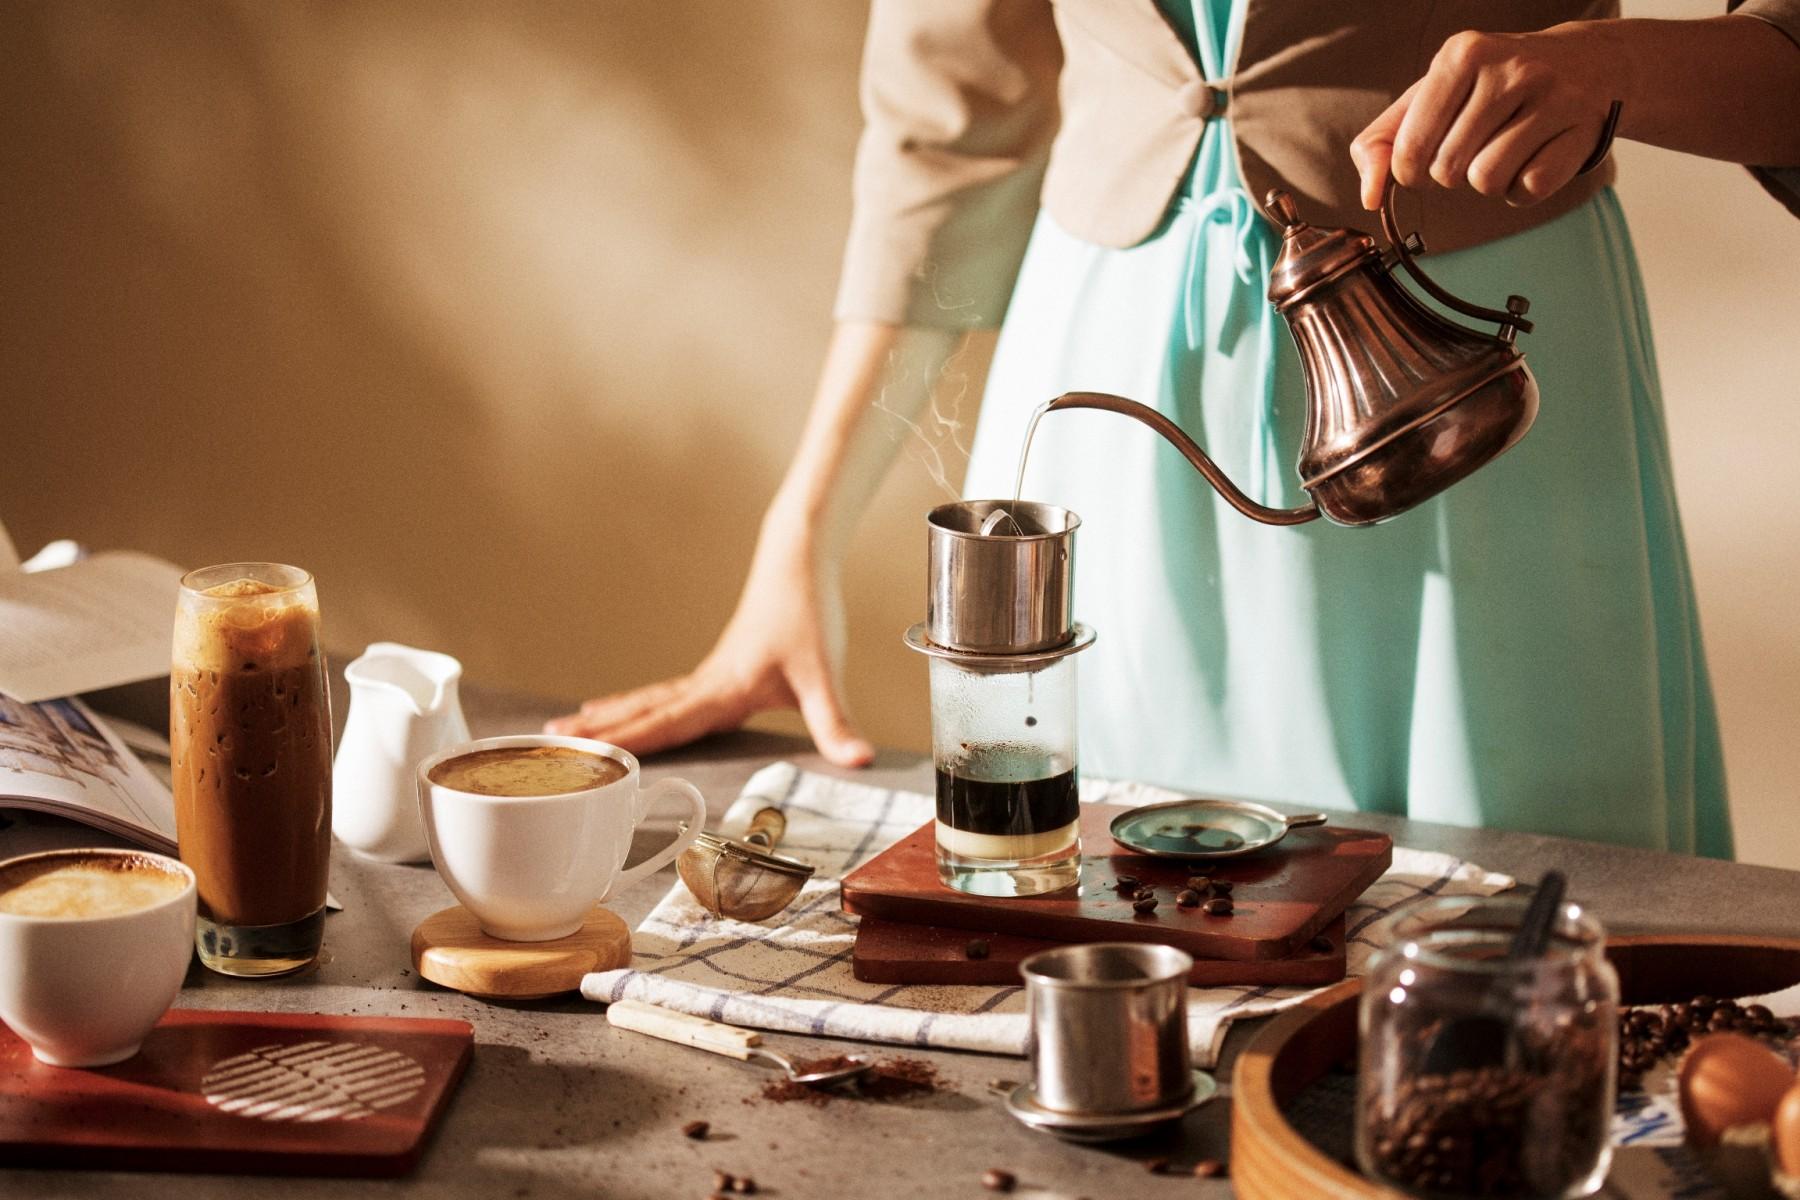 vietnamese-coffee-making-class